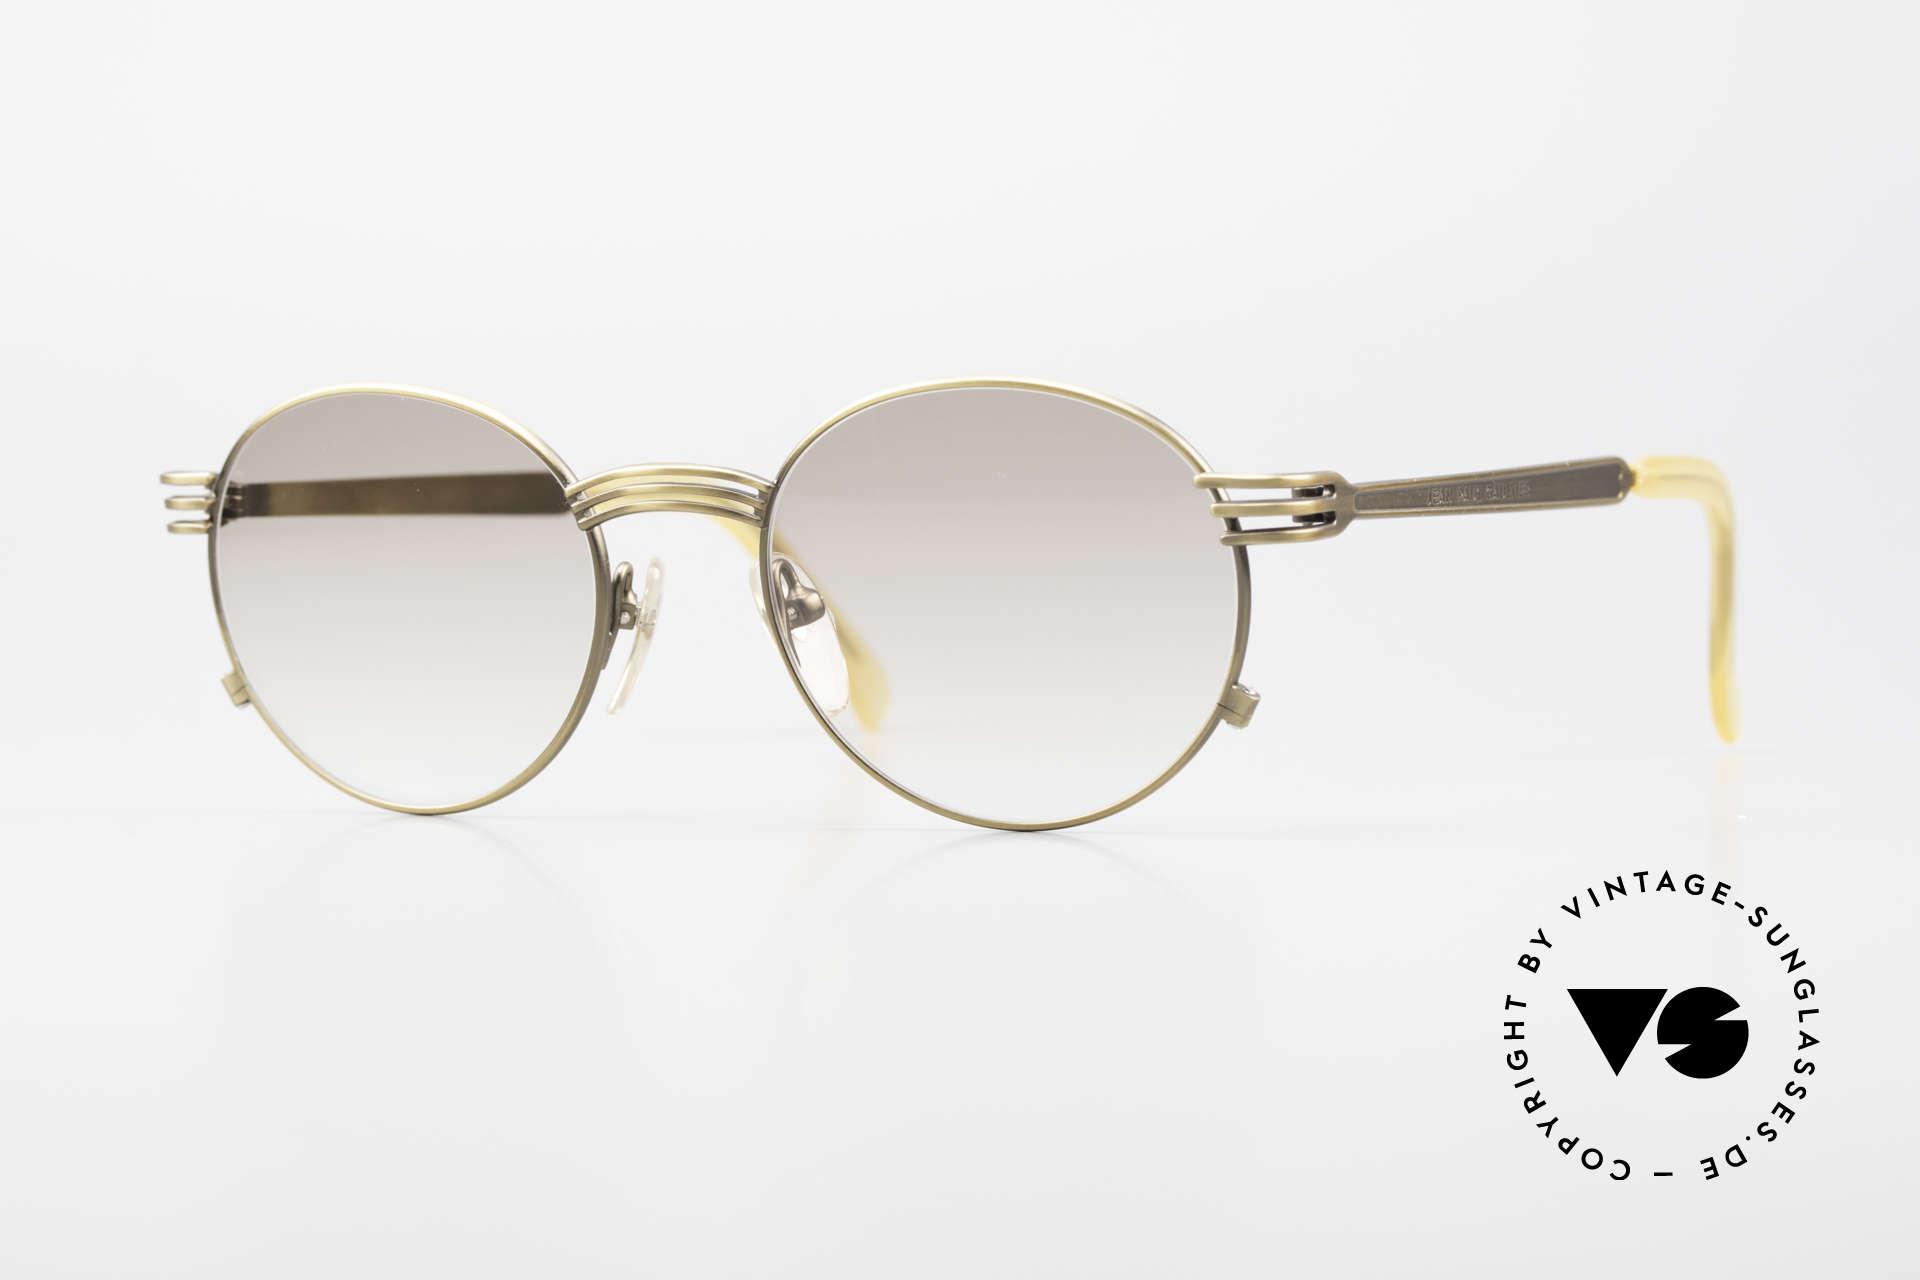 Jean Paul Gaultier 55-3174 Designer Vintage Glasses 90's, valuable & creative Jean Paul Gaultier designer glasses, Made for Men and Women